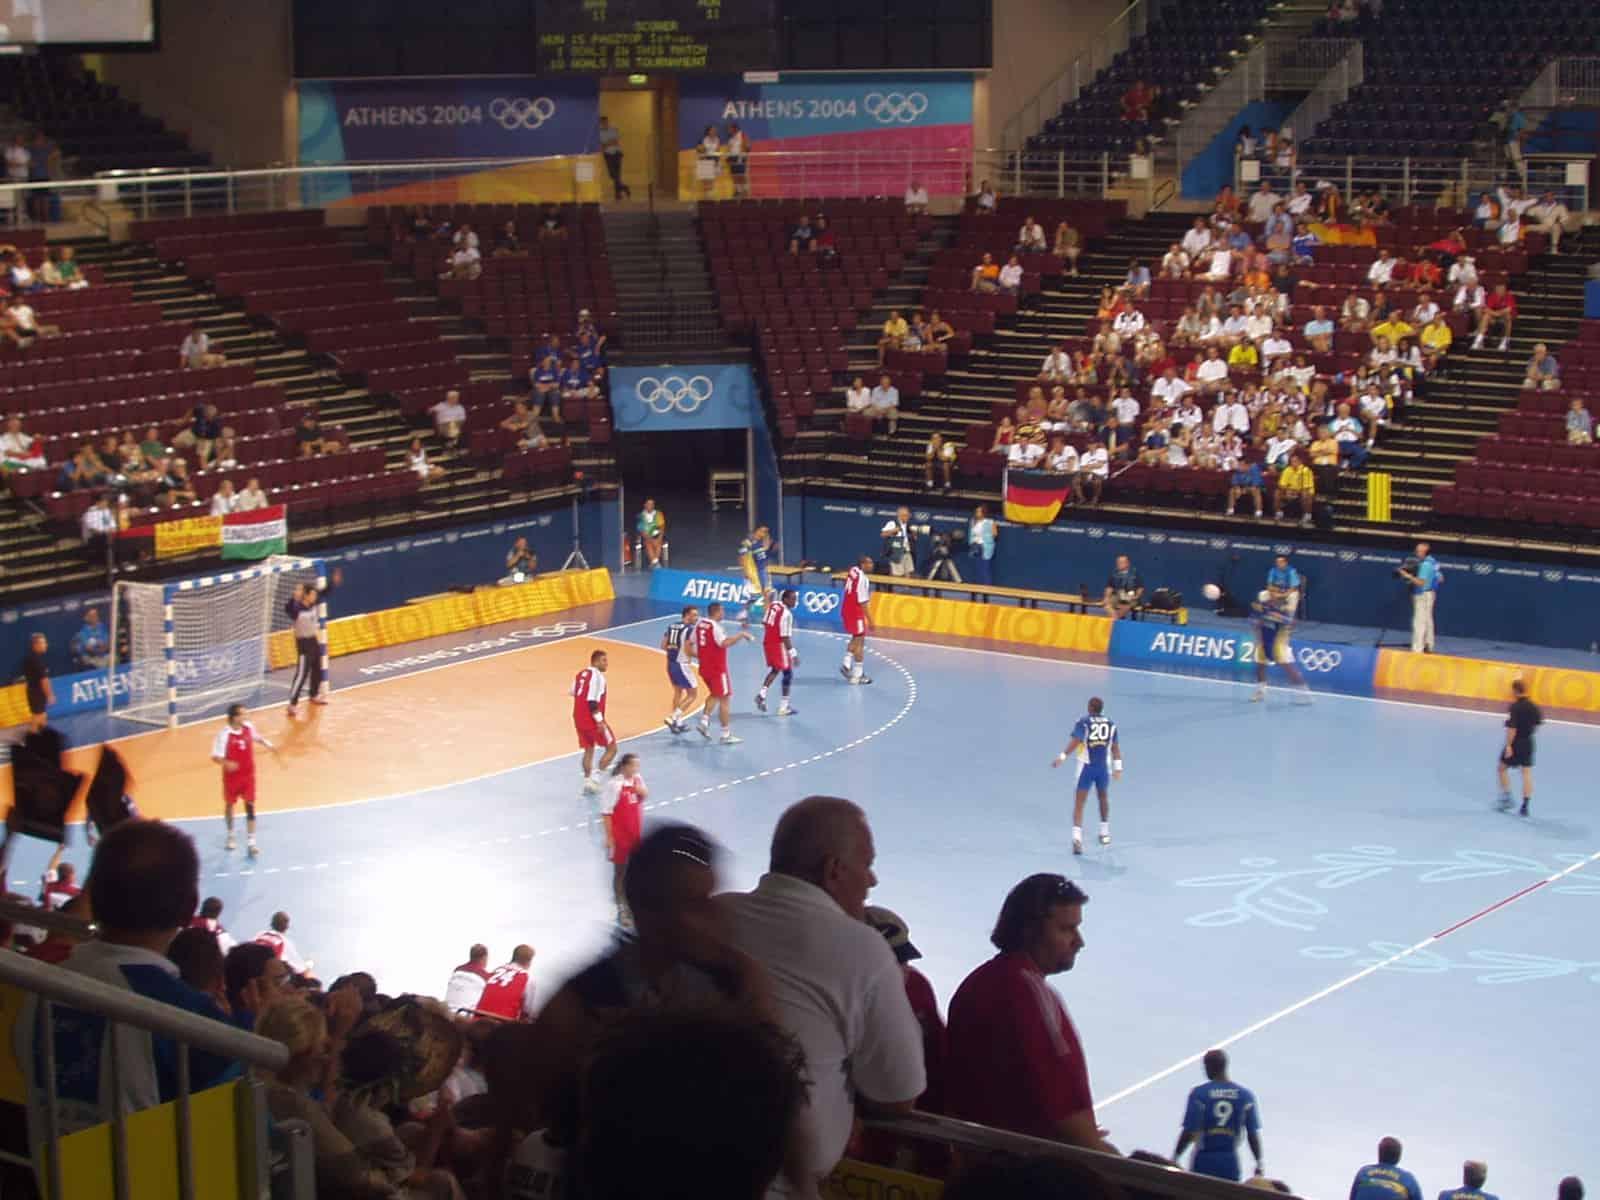 handball sport athens 2004 image page (3)